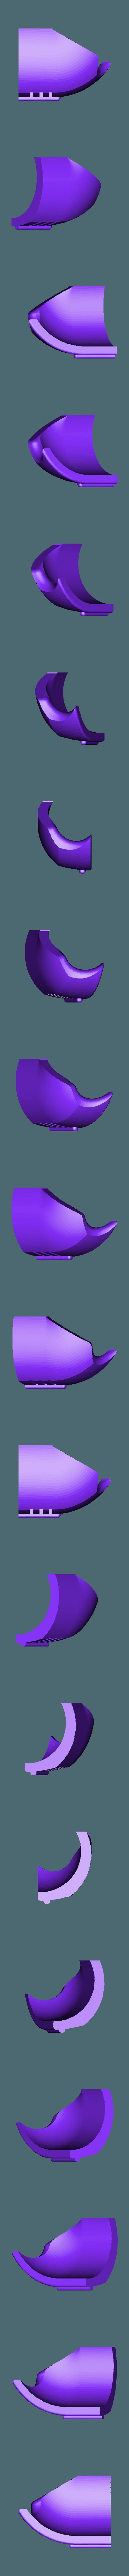 Hood_-_Left.stl Download free STL file Imperial Crusader Mech - New Legs • 3D printable model, GarinC3D